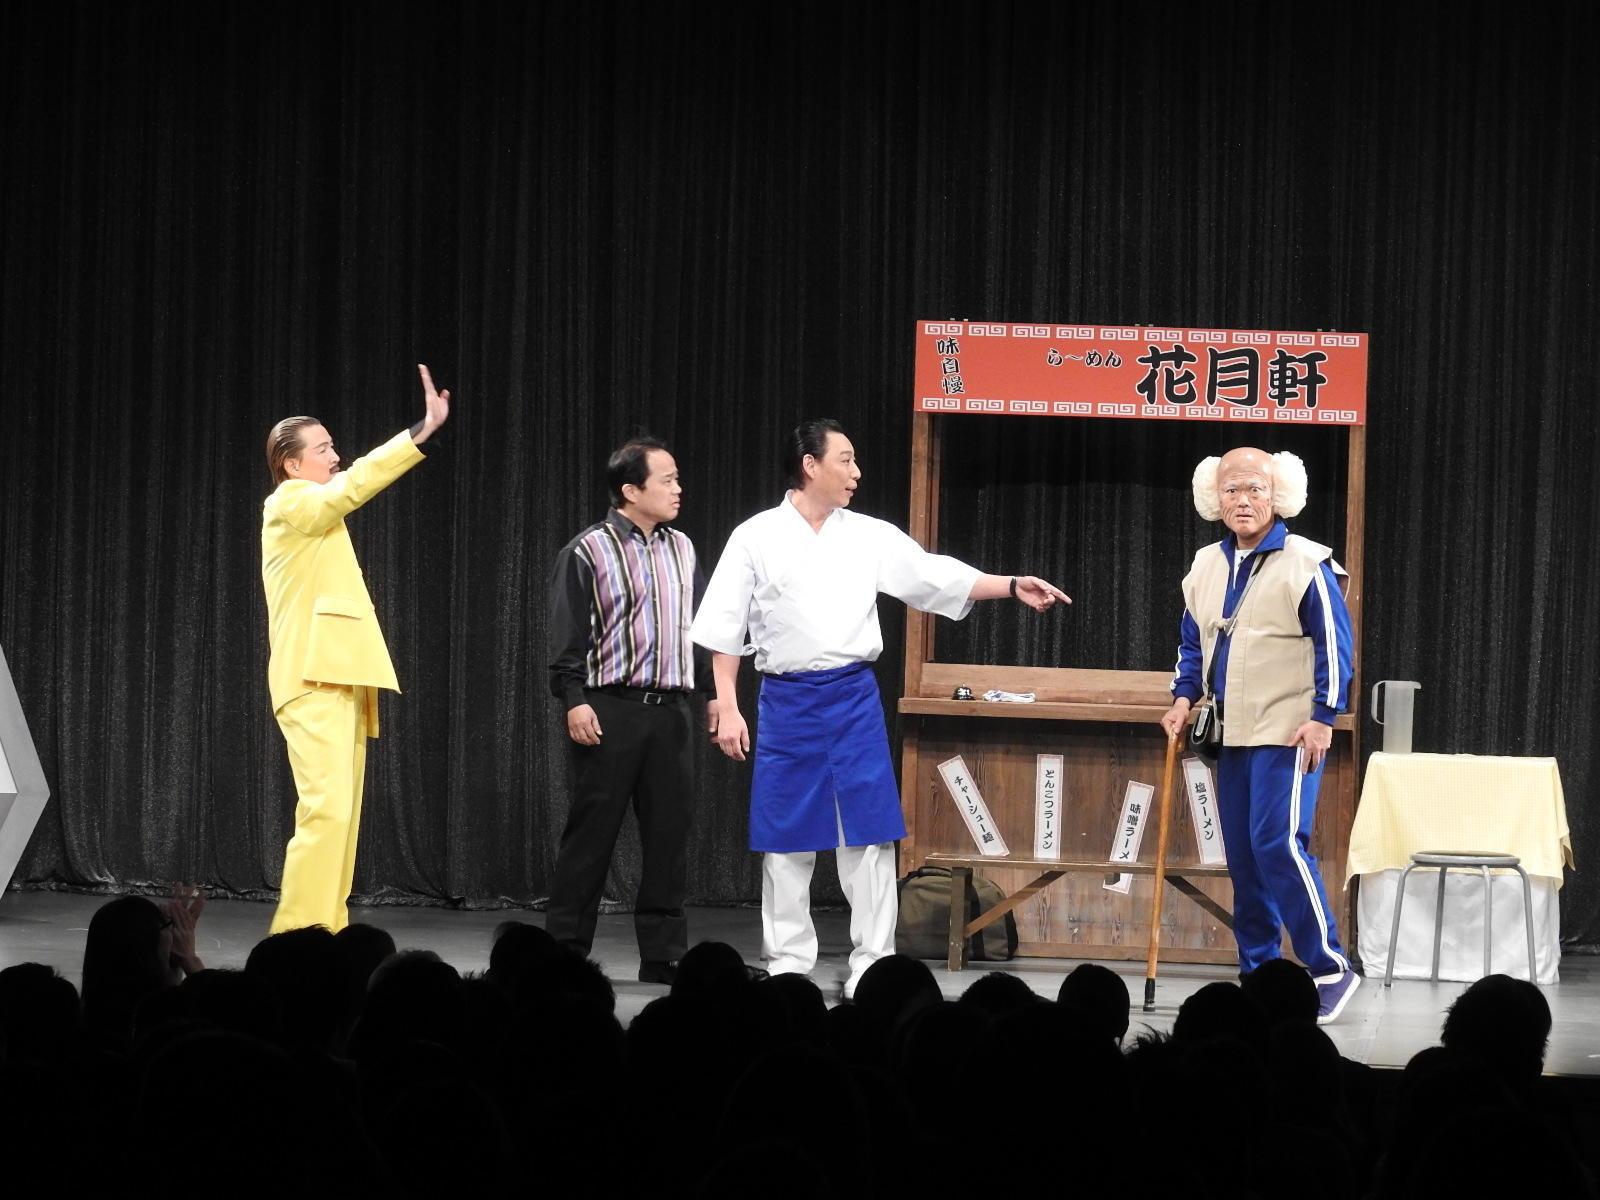 http://news.yoshimoto.co.jp/20171108143209-c6c991ed8493d1fe48c90dc2838dec4f0b9e5bcc.jpg